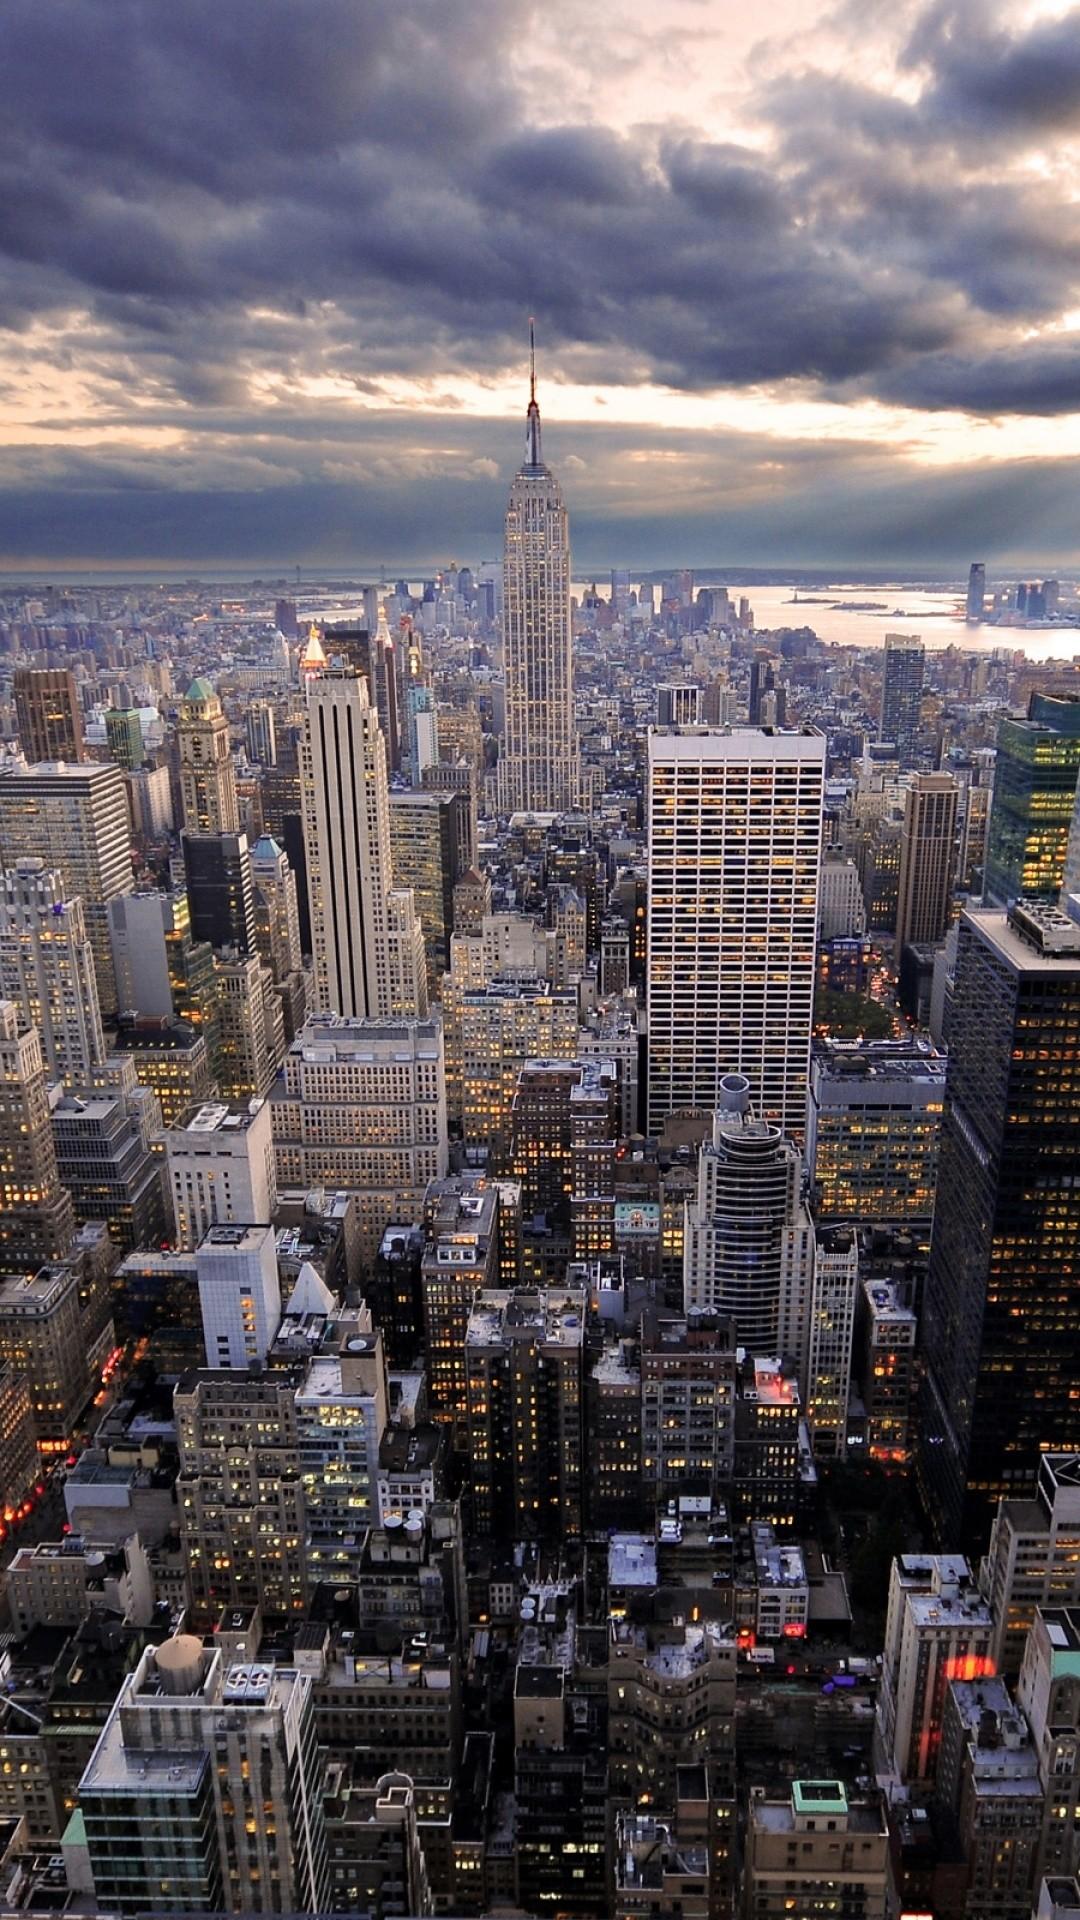 Gallery of New York Yankees Iphone Wallpaper 8211 Pqh9AS